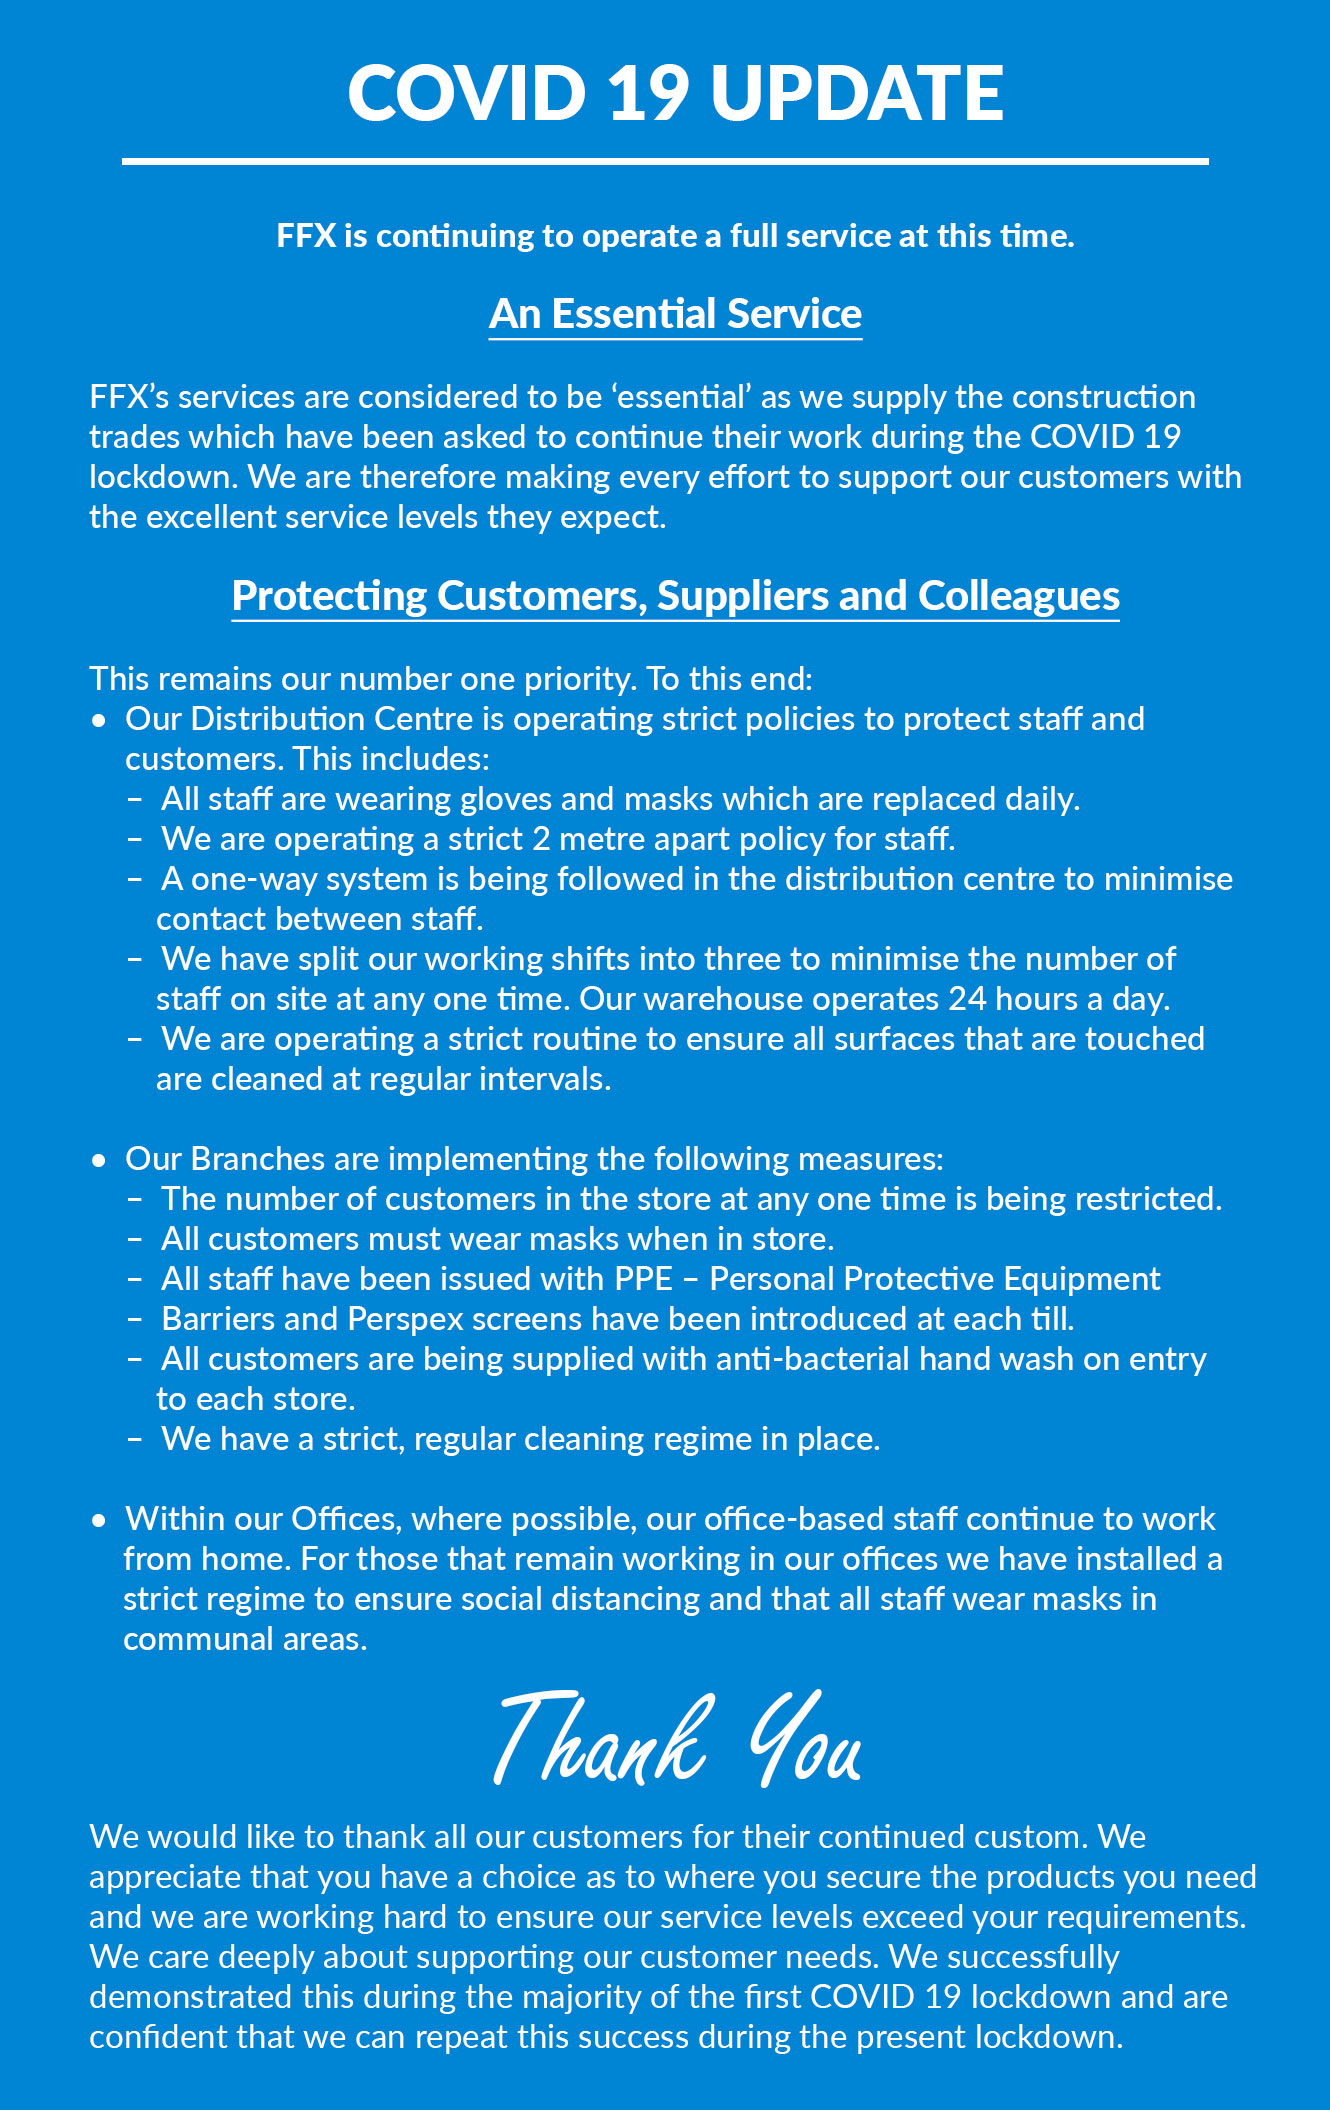 FFX Covid 19 Response